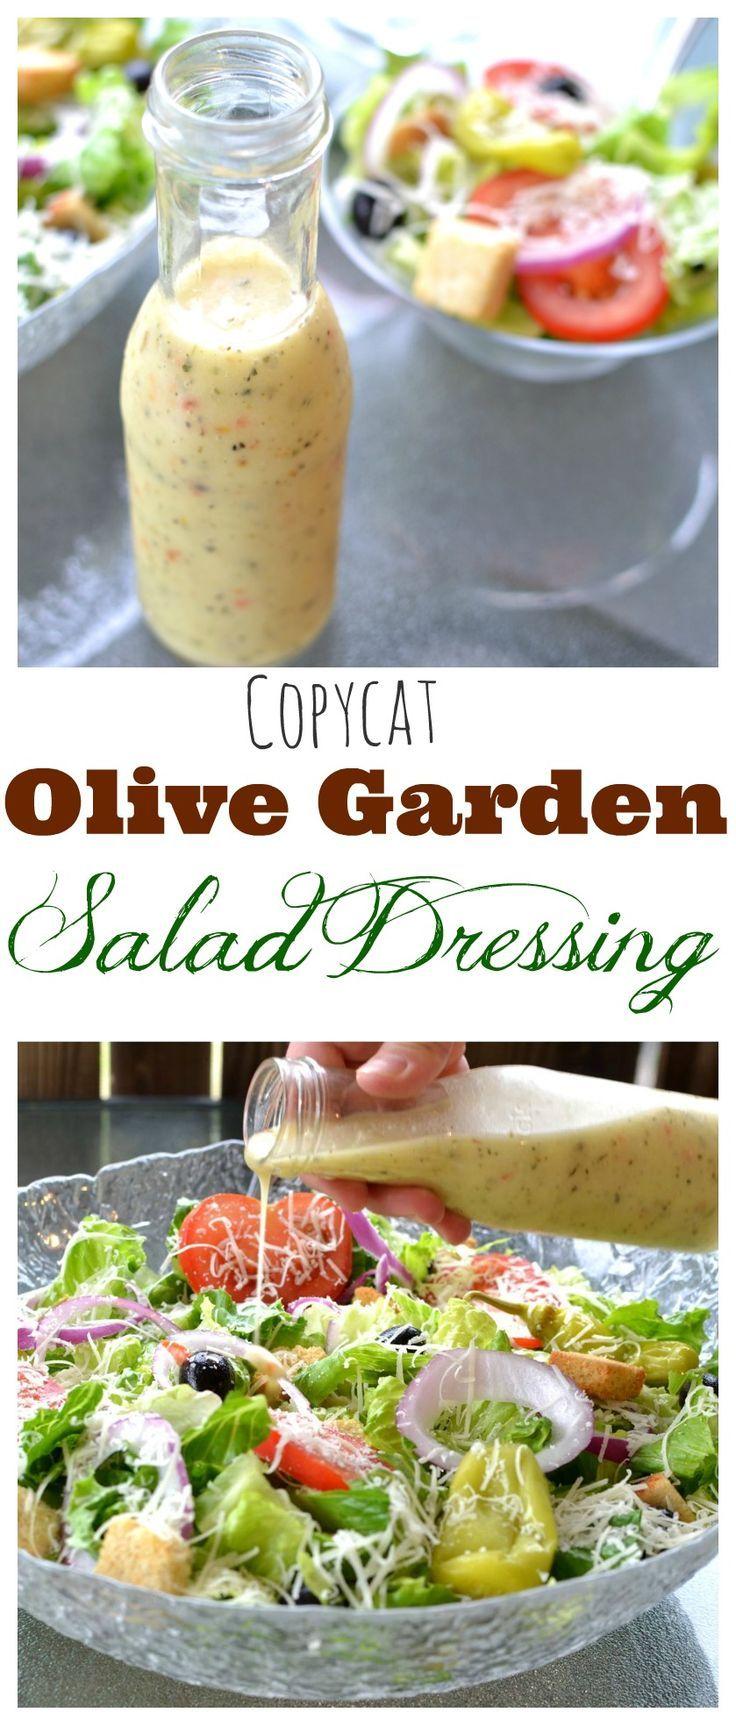 Diet plans copycat olive garden salad dressing fitnessviral magazine your number one for Olive garden salad dressing recipe secret